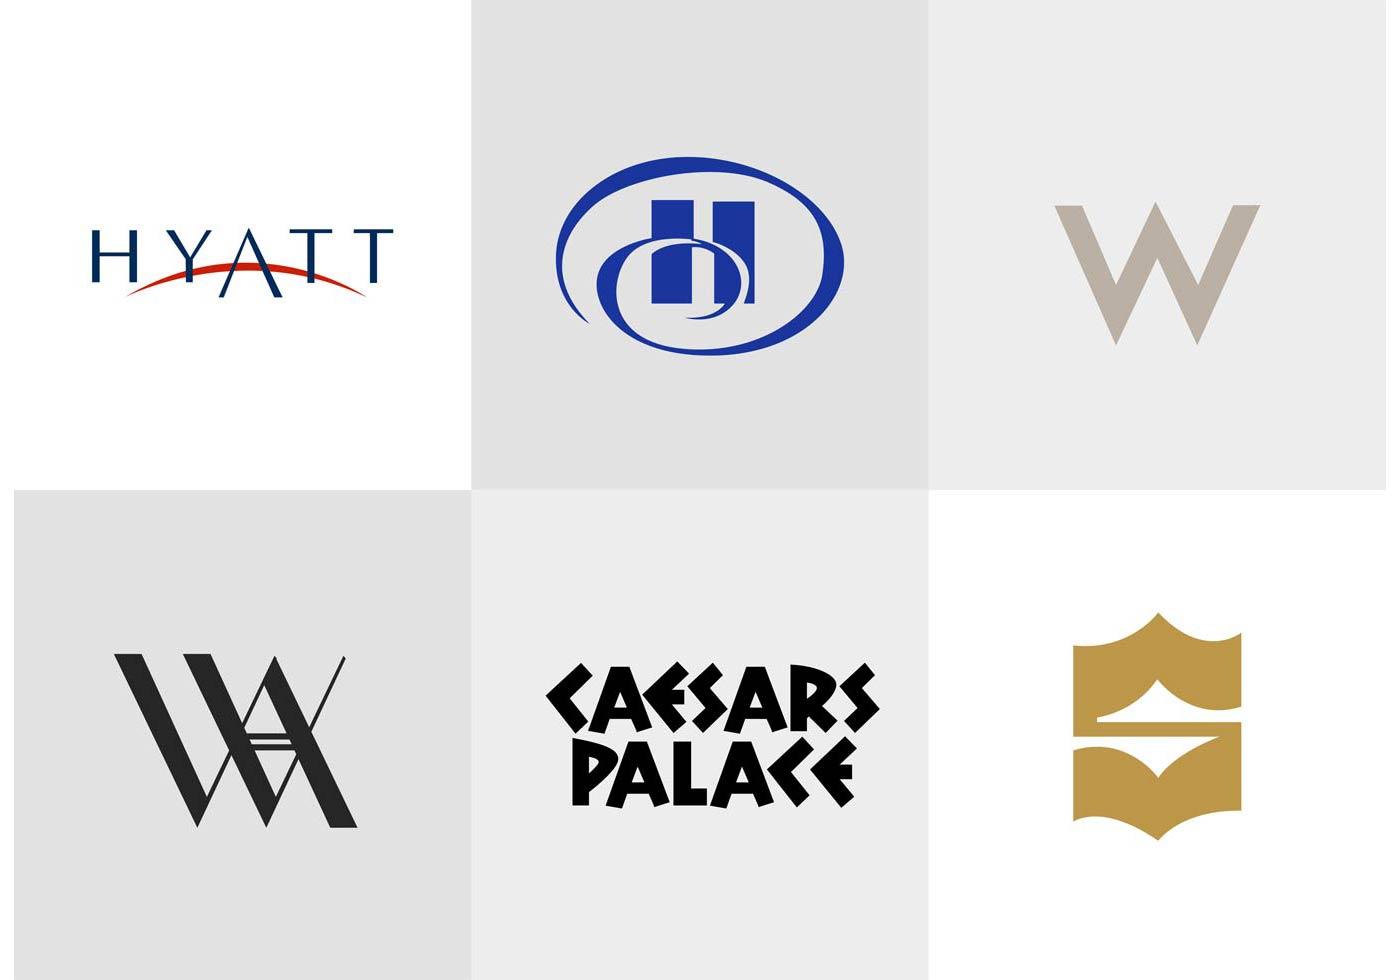 hotels logo vectors download free vector art stock